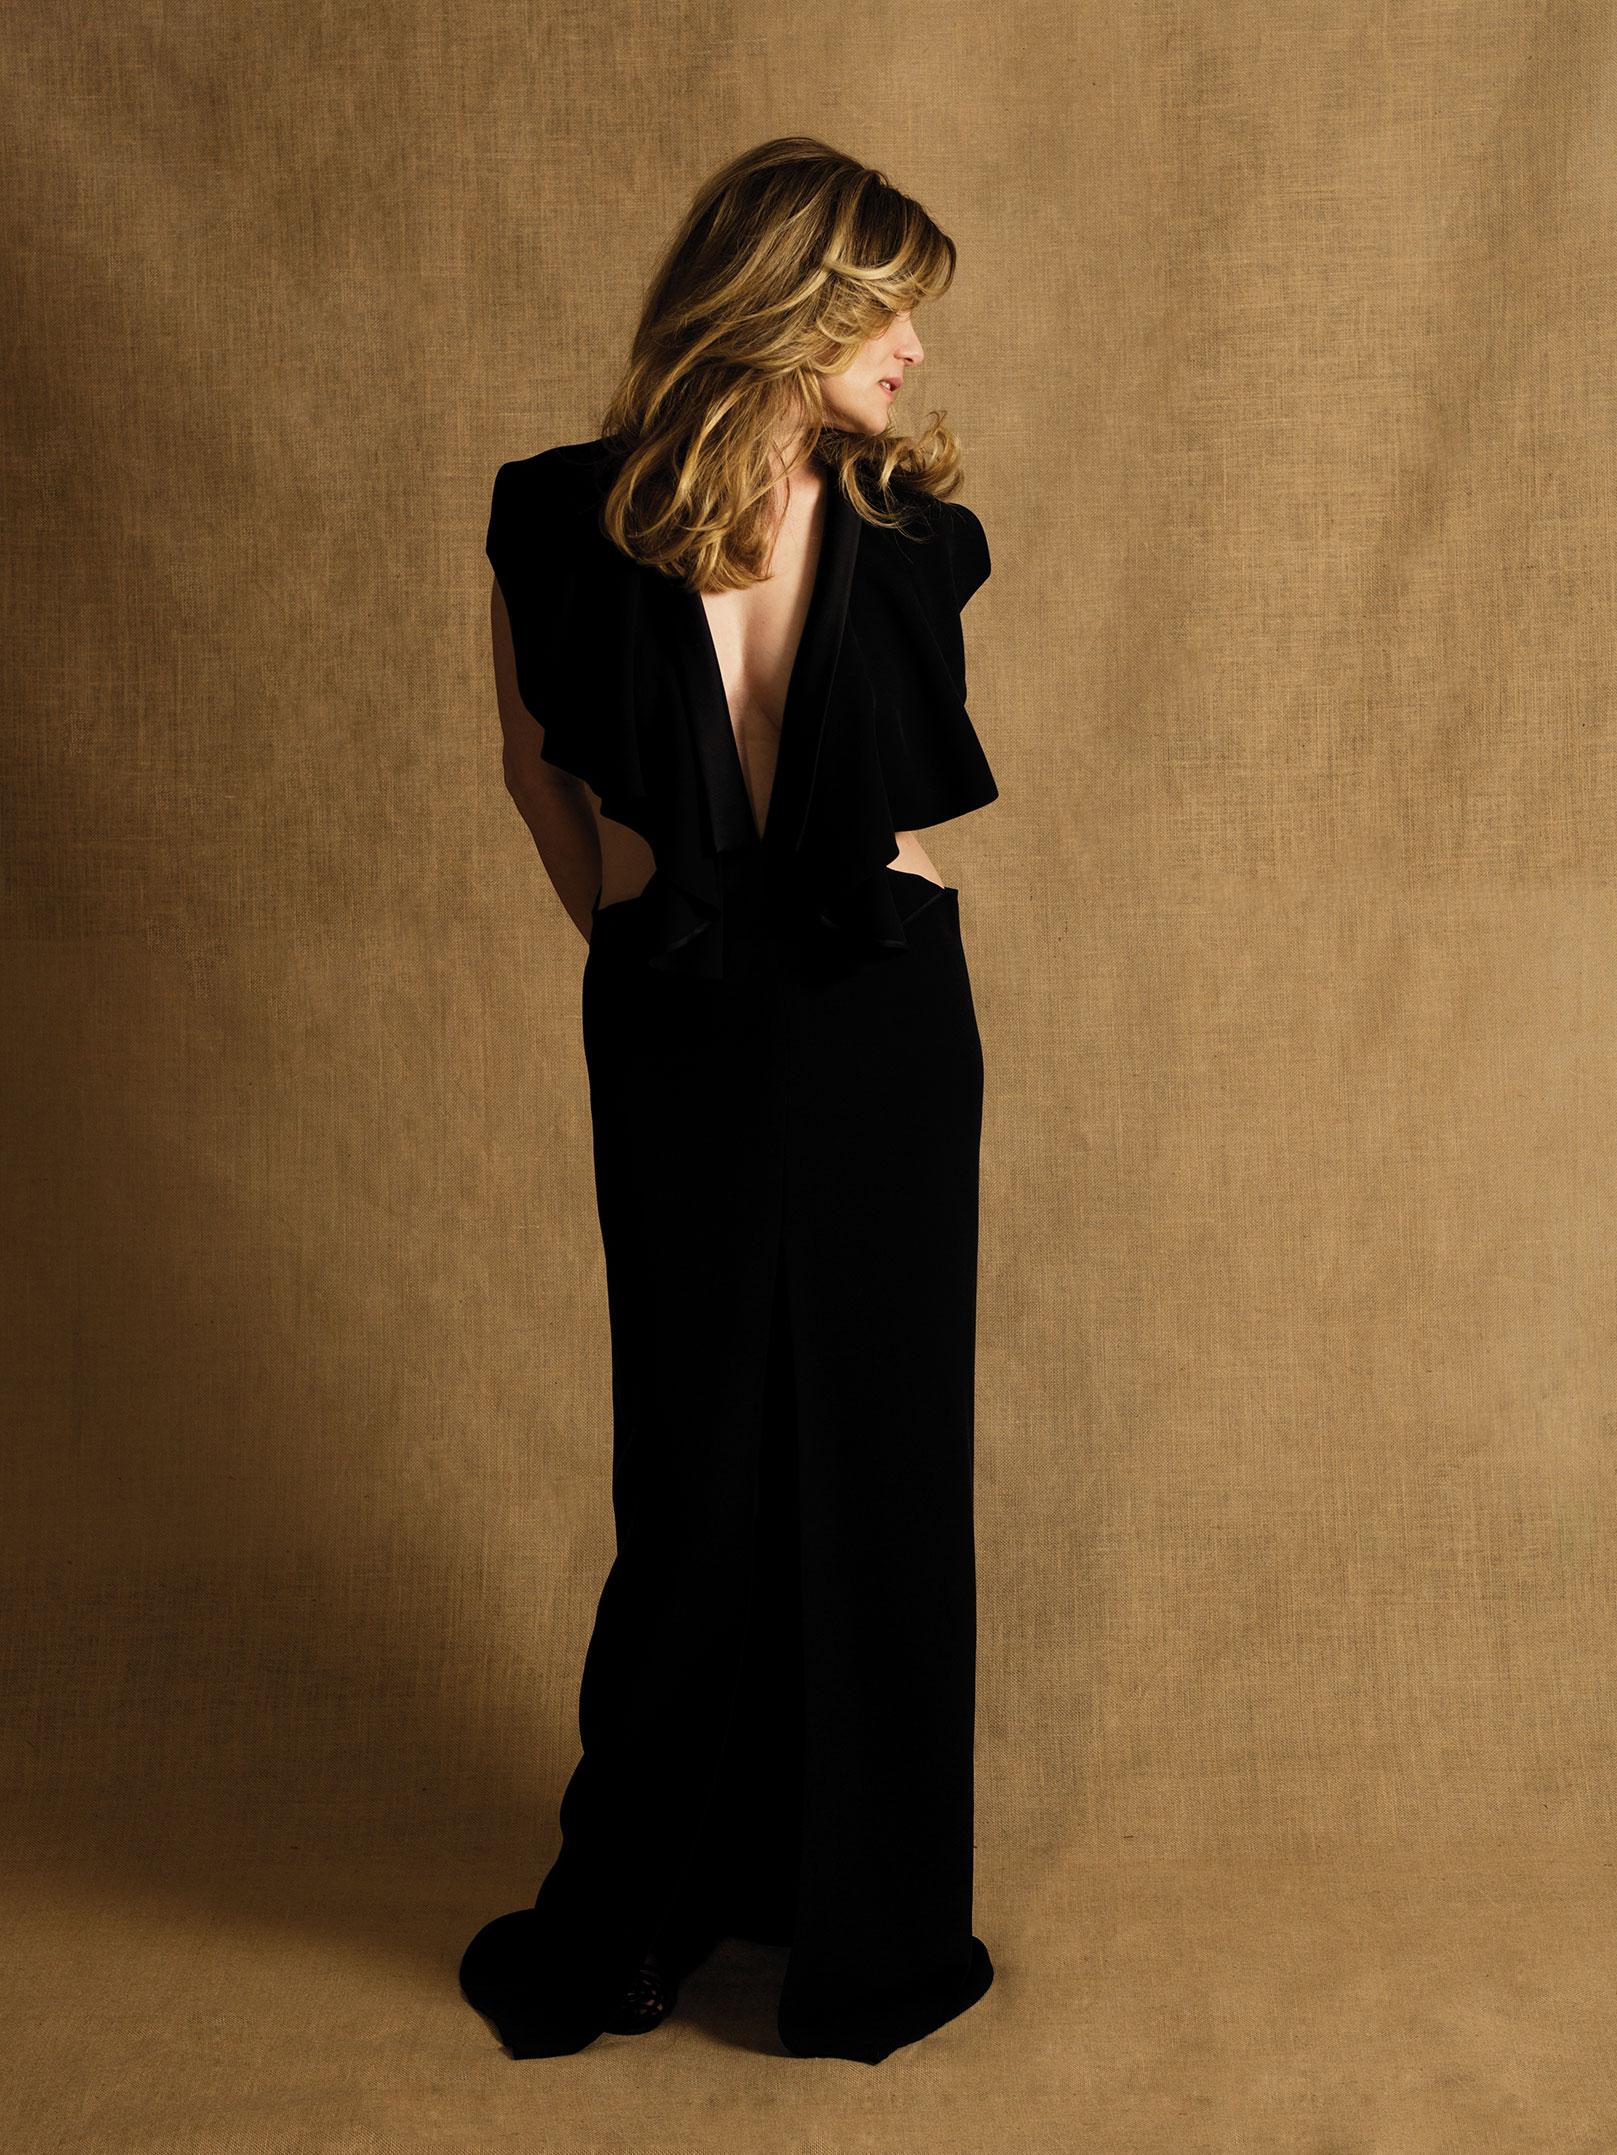 Emmanuelle Seigner On Acting Crash Magazine